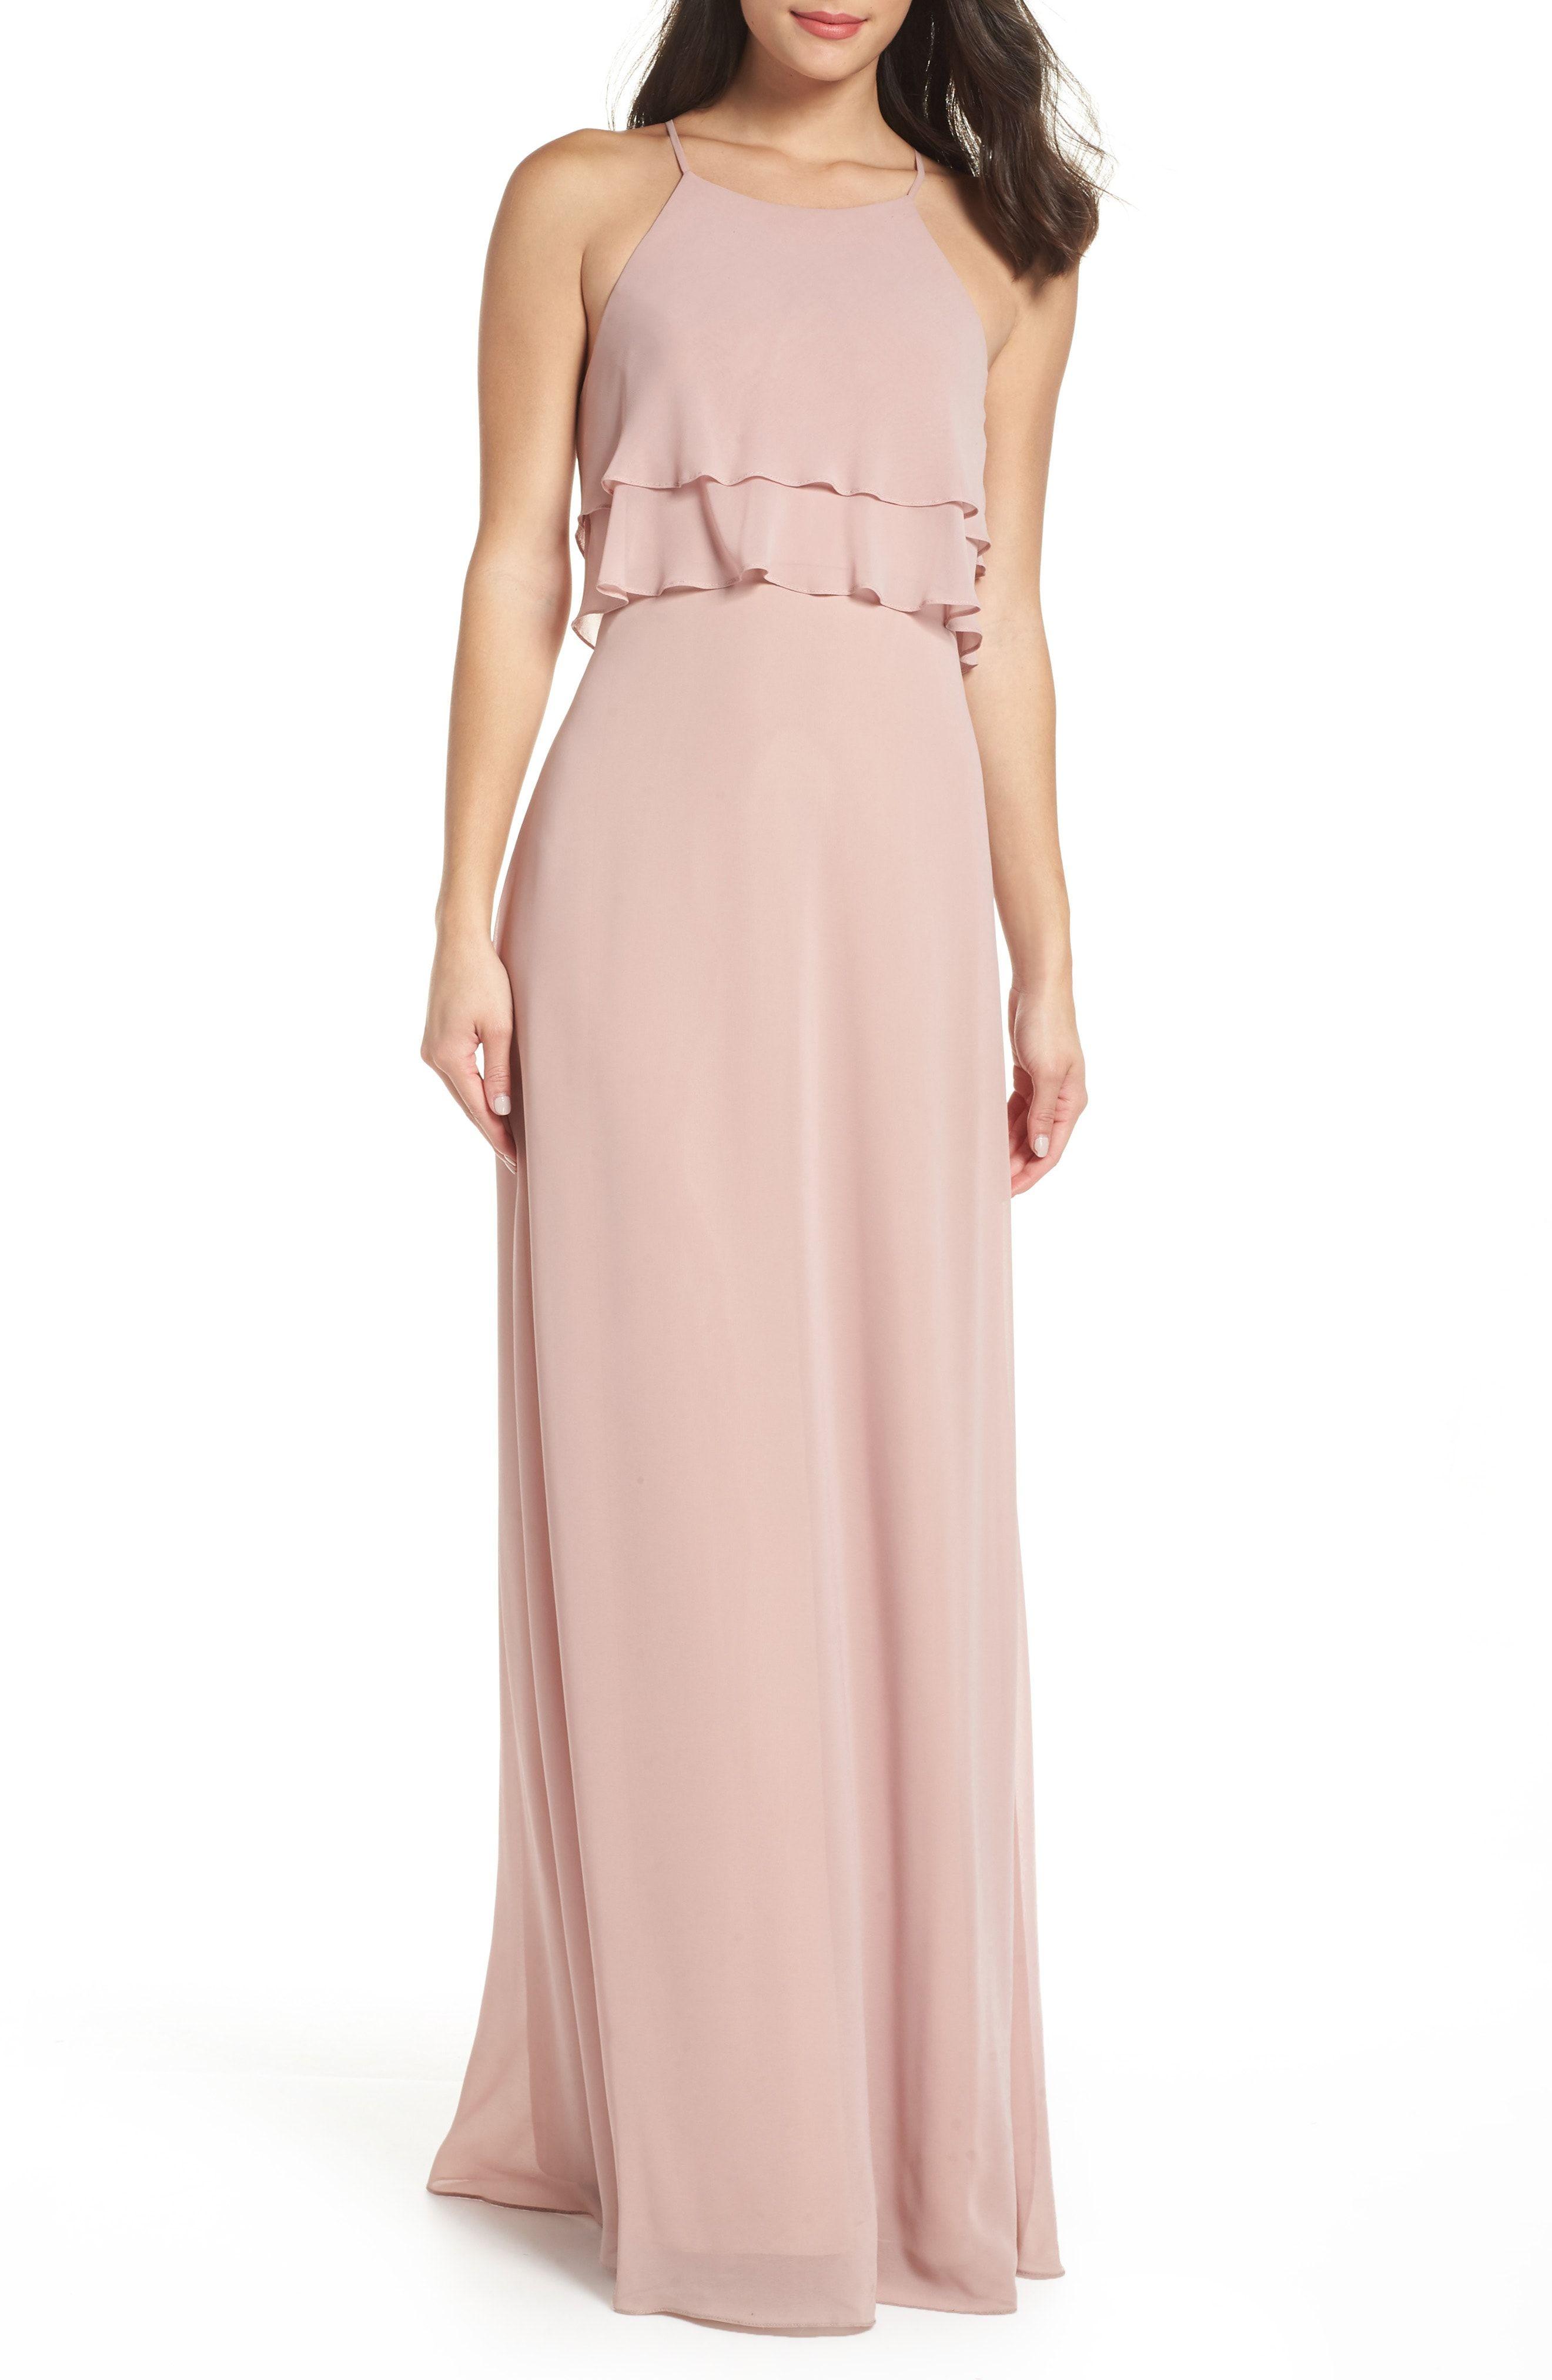 Ruffled blush bridesmaid dress by jenny yoo blushwedding